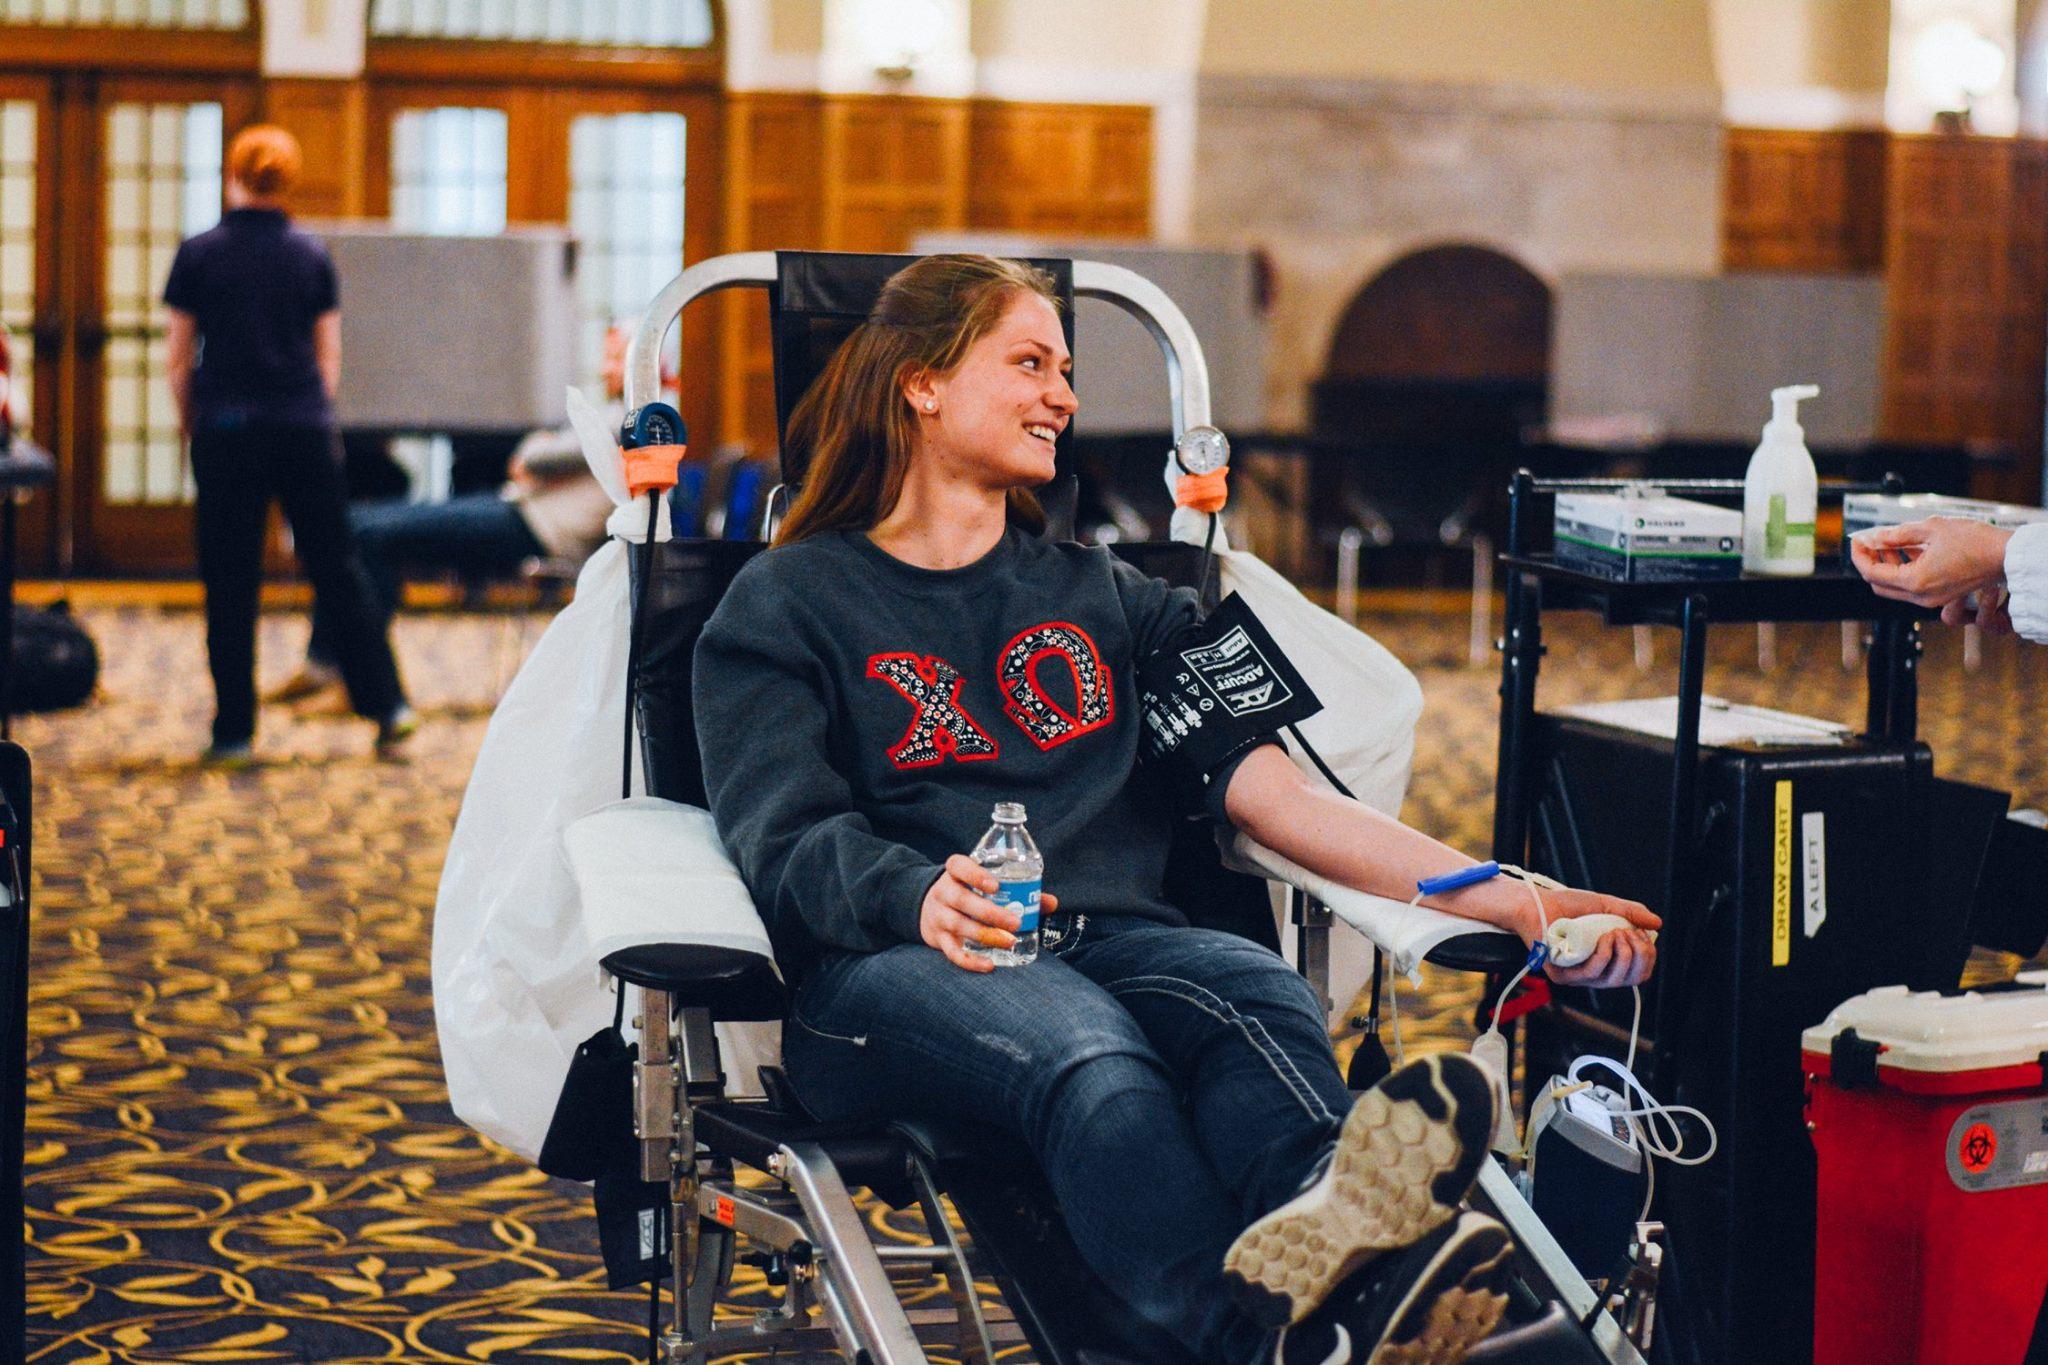 Junior Abby Renner donates blood during Greek Week. Photo by Melissa Quaiyoom